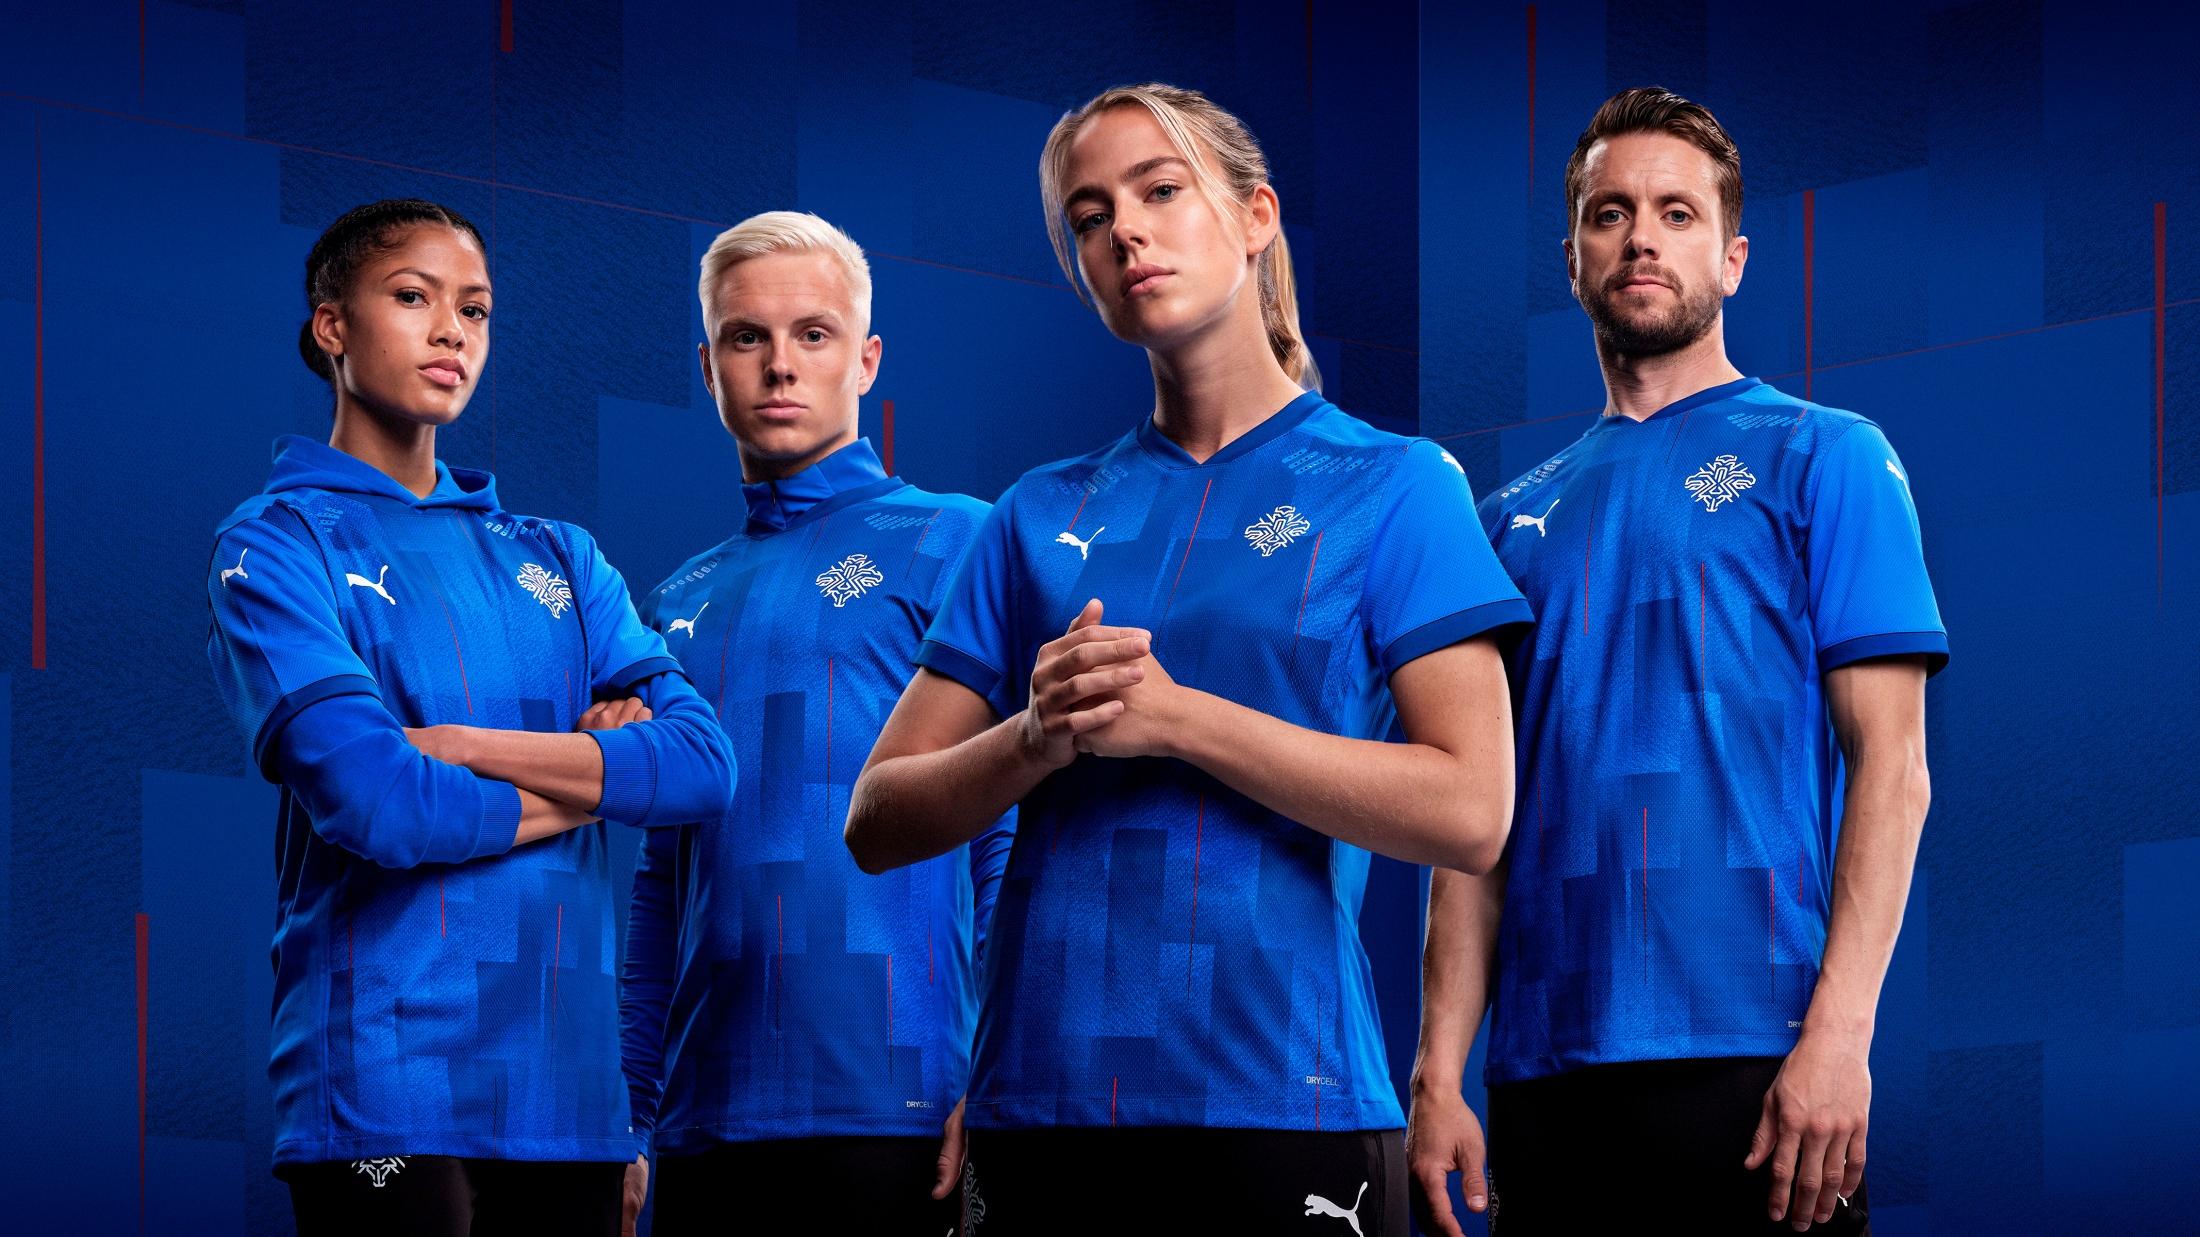 Thumbnail for The Icelandic National Team